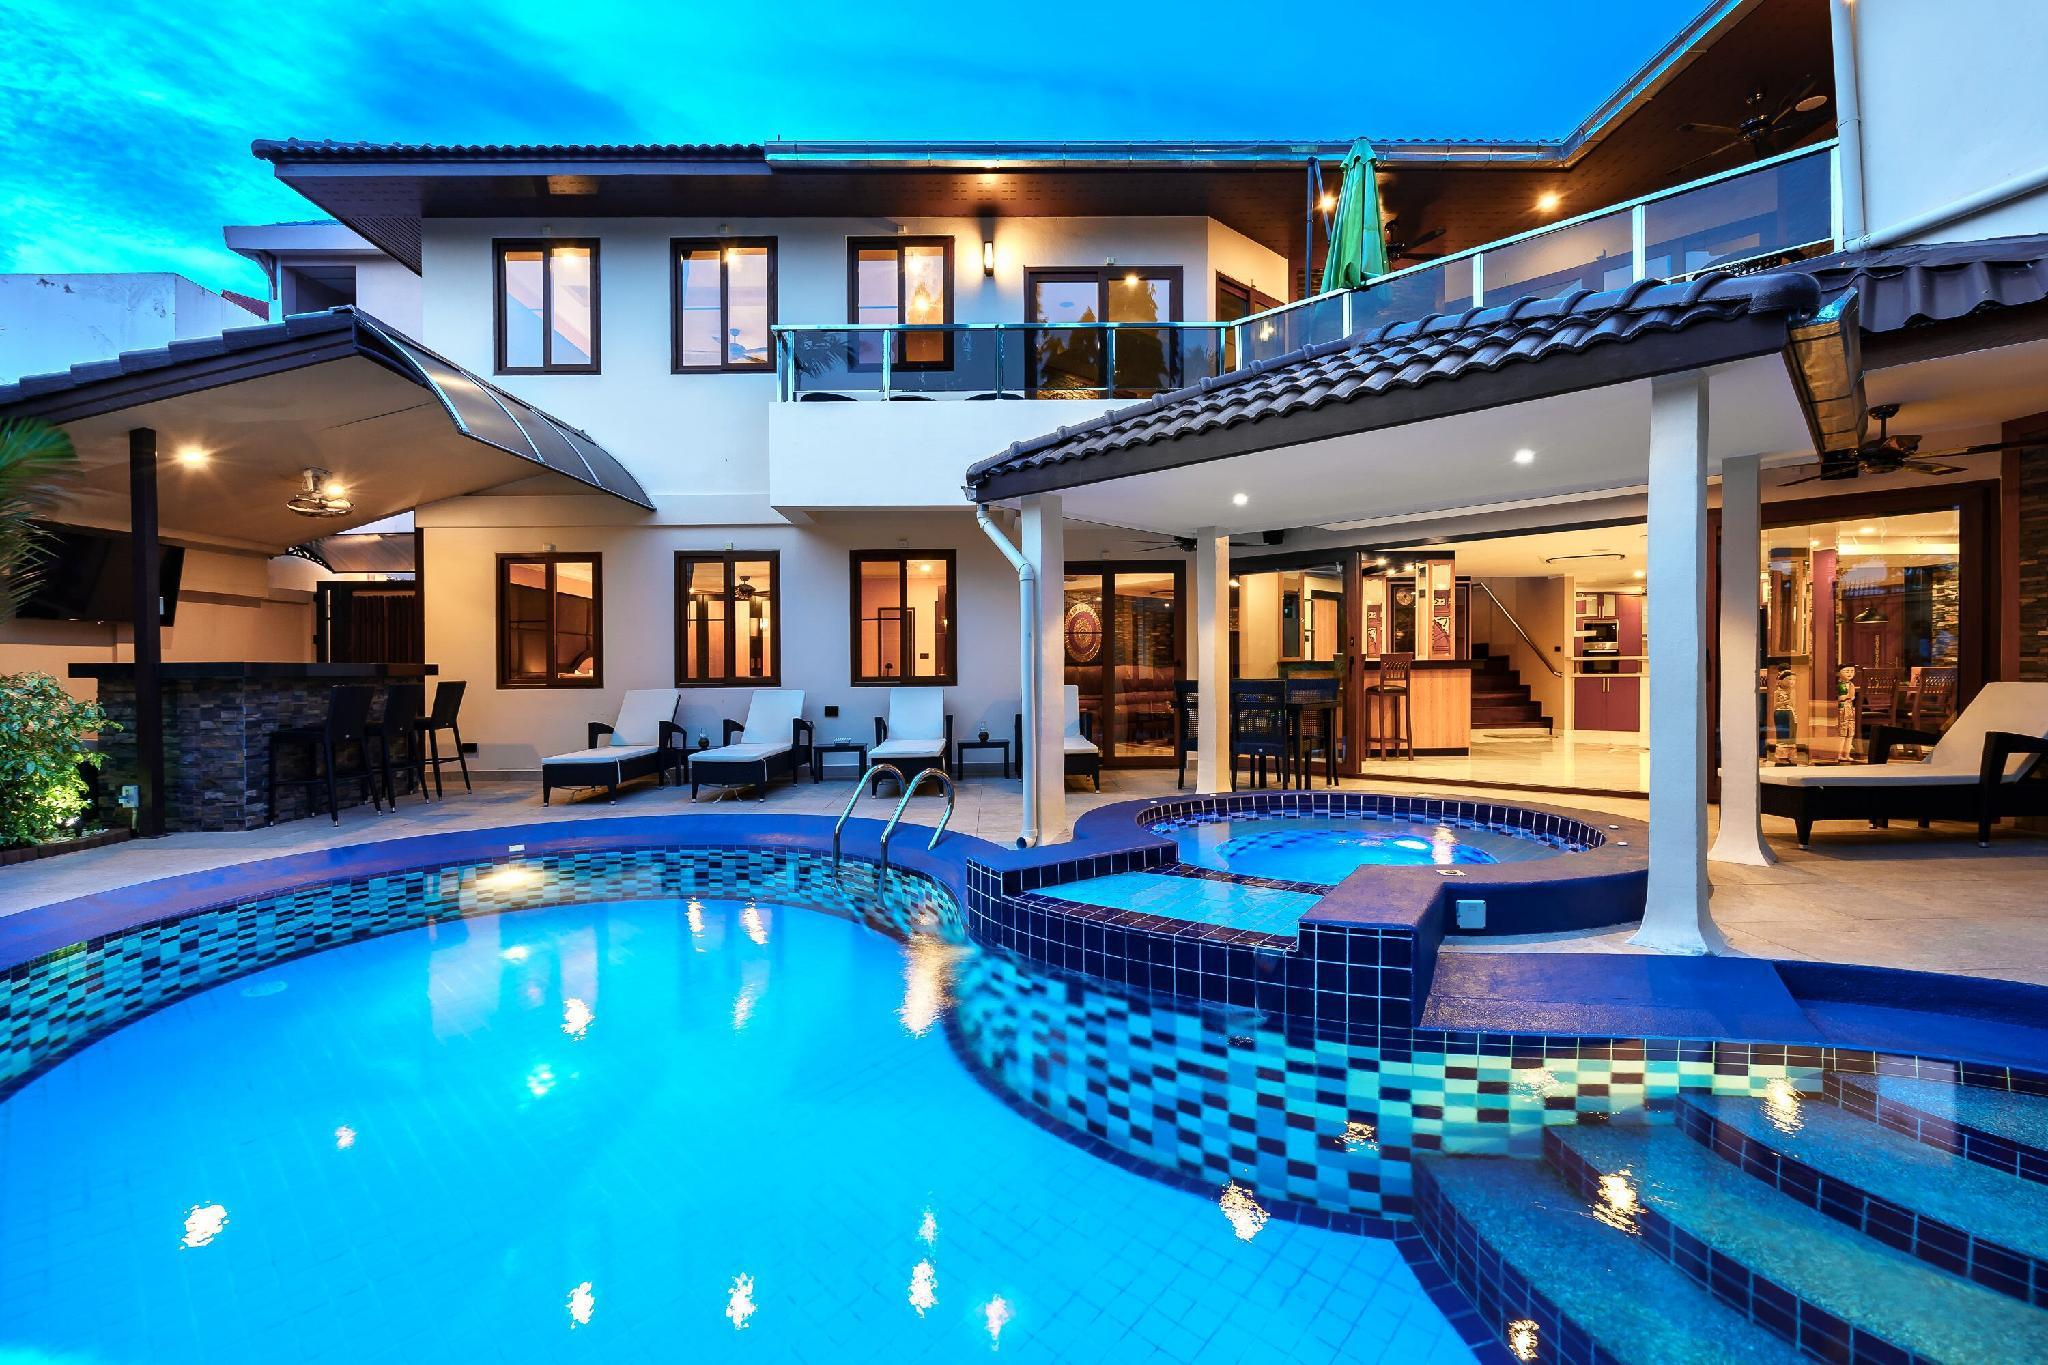 Luxury Pool Villa T1 Near Walking Street 4+1 BR วิลลา 5 ห้องนอน 6 ห้องน้ำส่วนตัว ขนาด 600 ตร.ม. – เขาพระตำหนัก